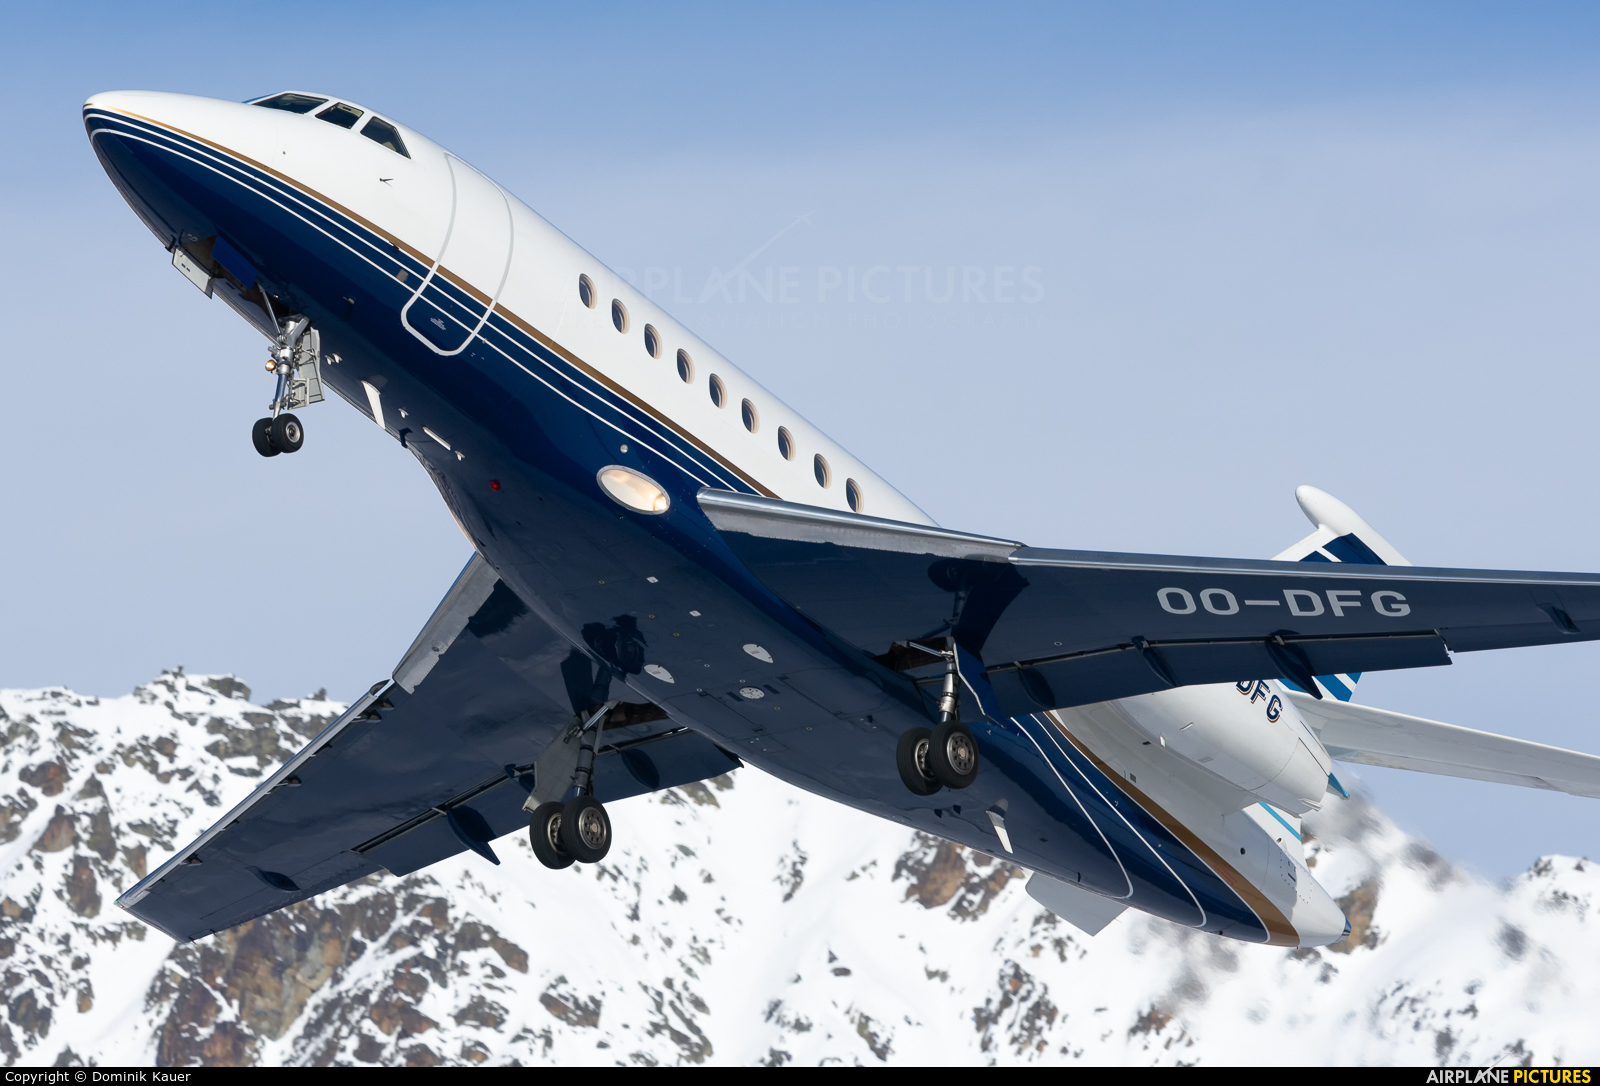 Abelag Aviation OO-DFG aircraft at Samedan - Engadin